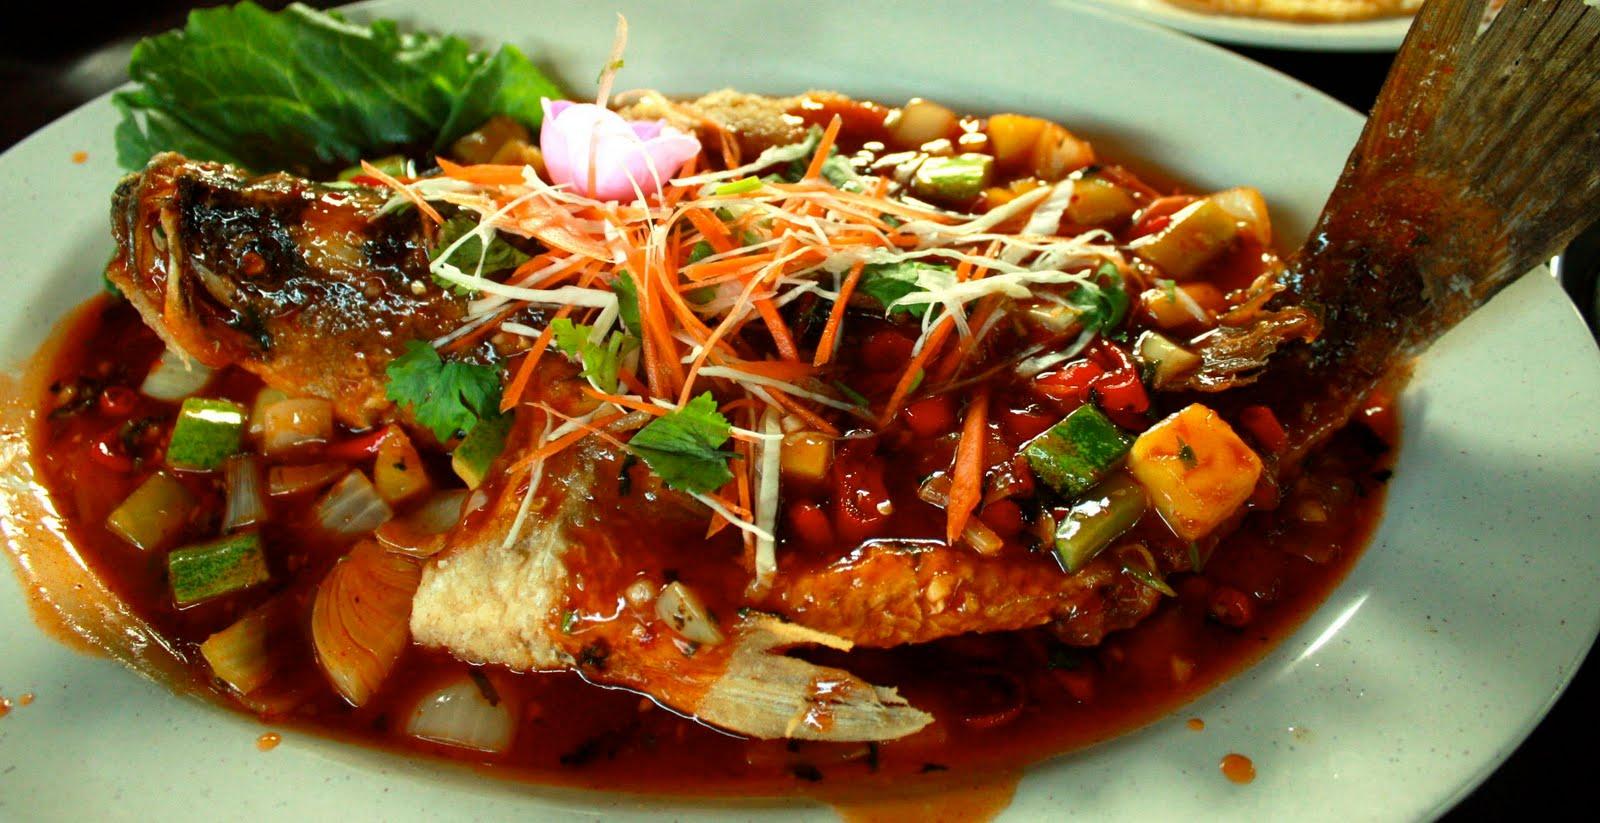 Market Recipe: Ikan Siakap Tiga Rasa or Sweet, Sour and Spicy Siakap Fish